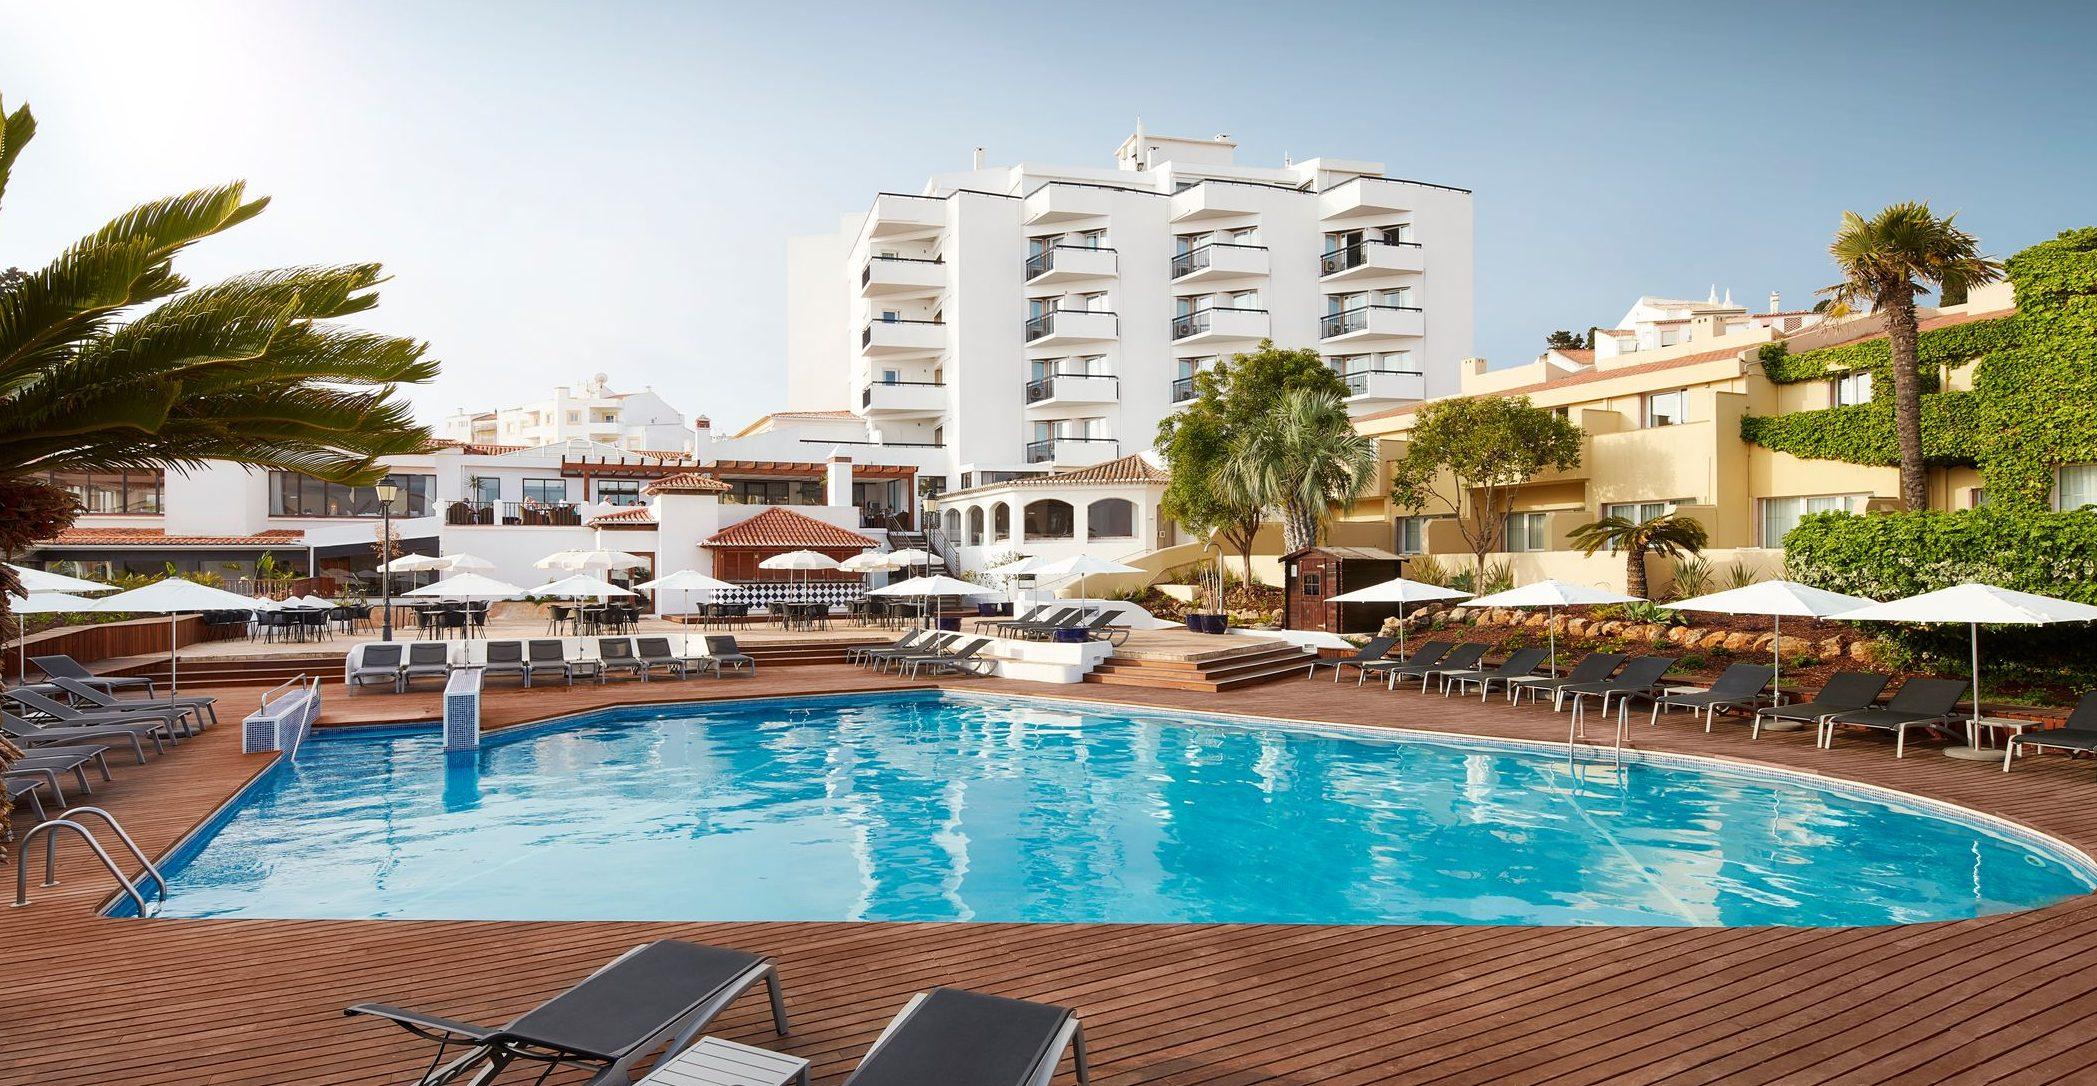 Hotell Tivoli Lagos med utomhuspool.